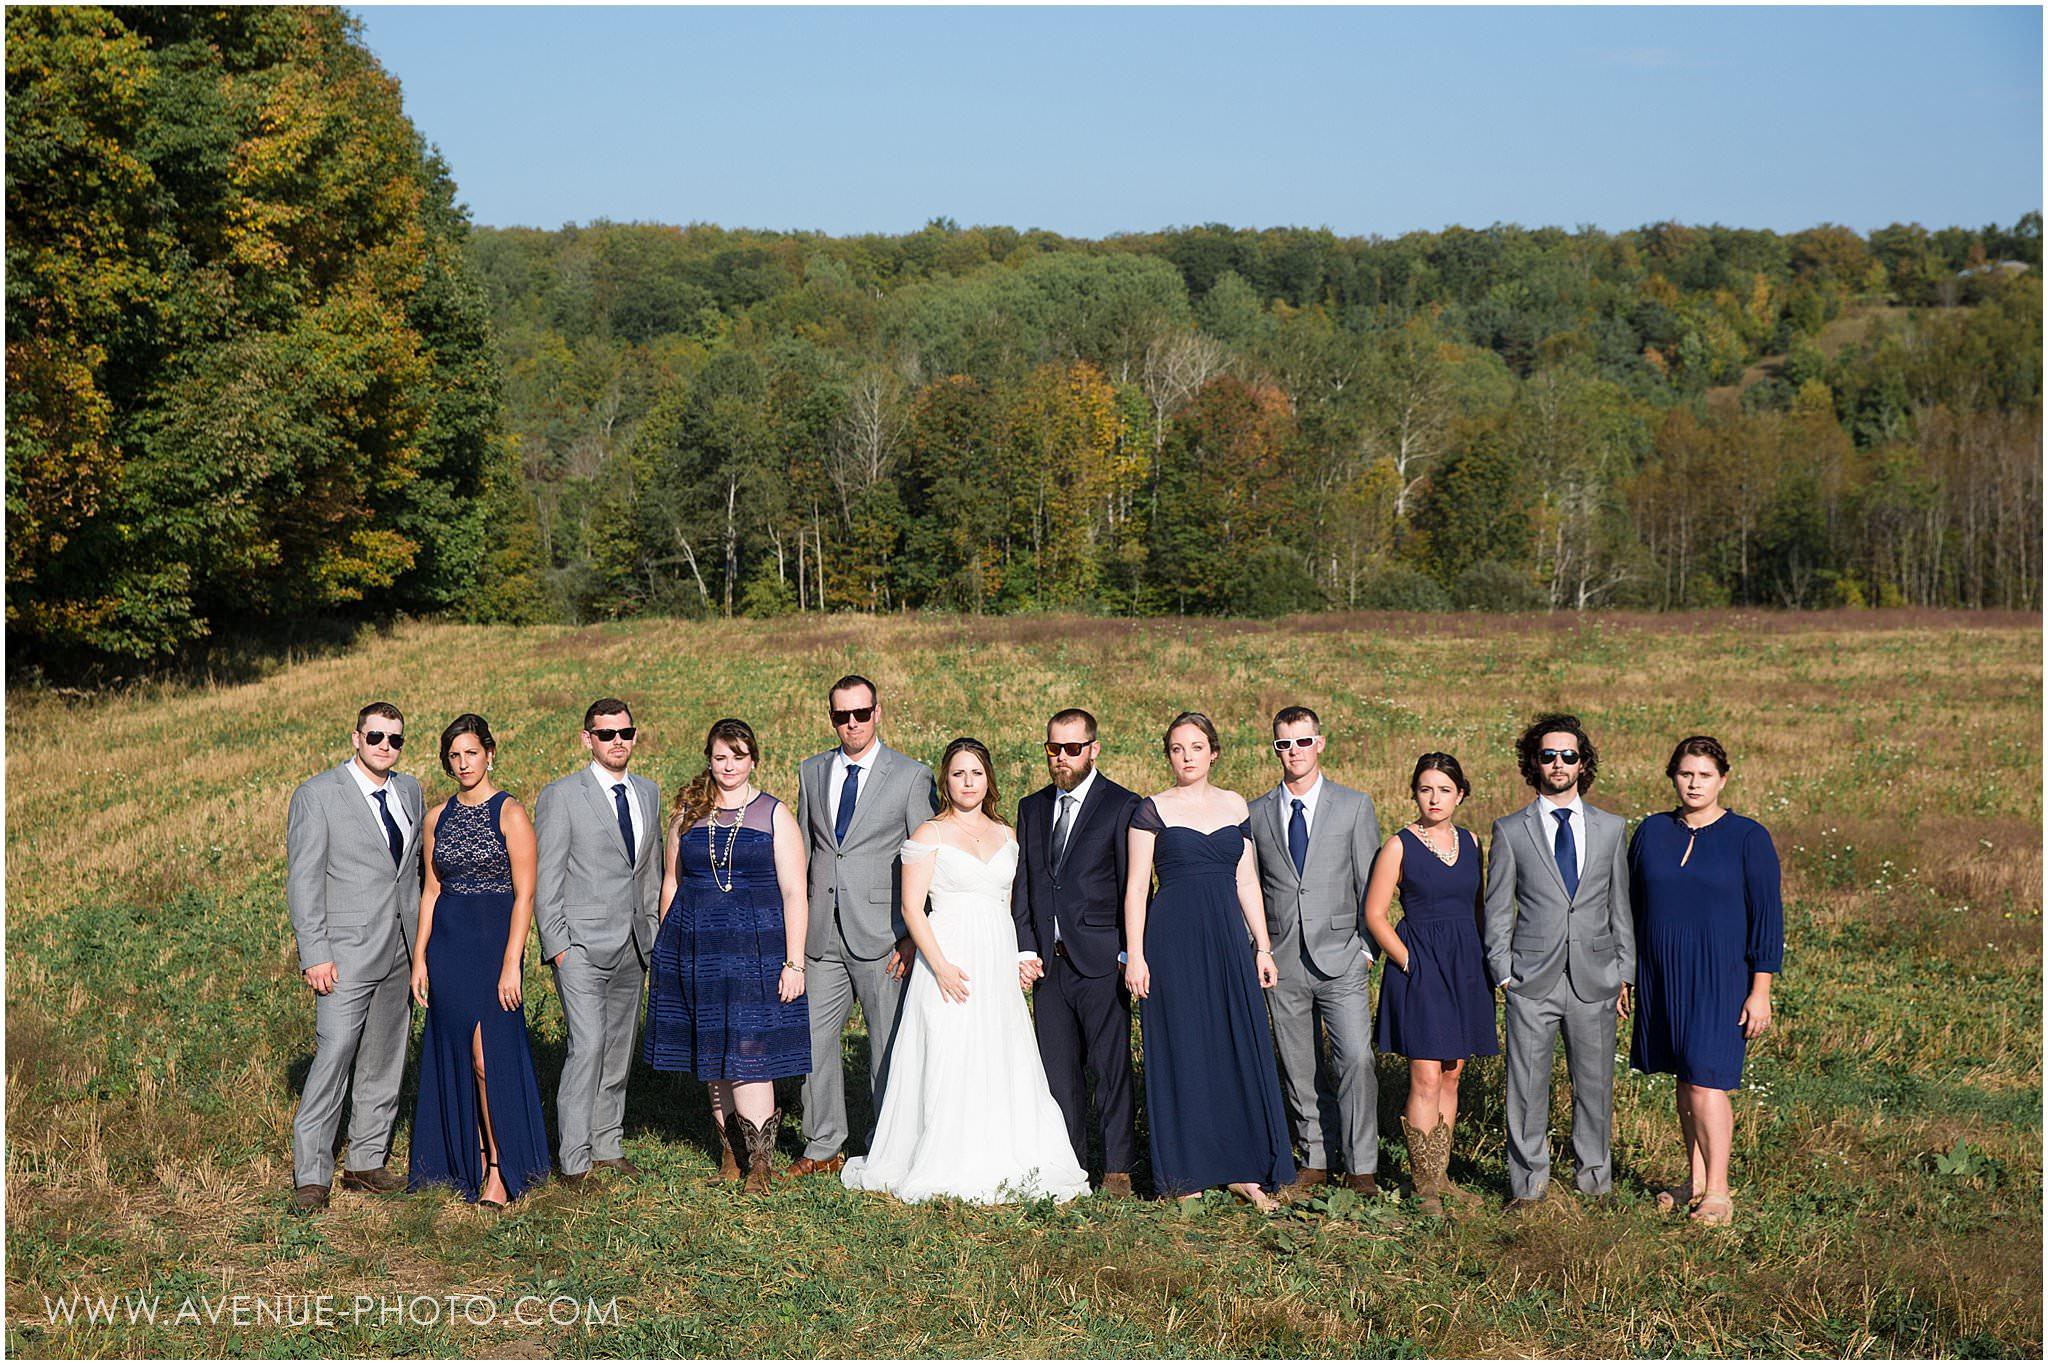 Country Farm Barn Wedding, Sugar Shack wedding photos, Avenue Photo